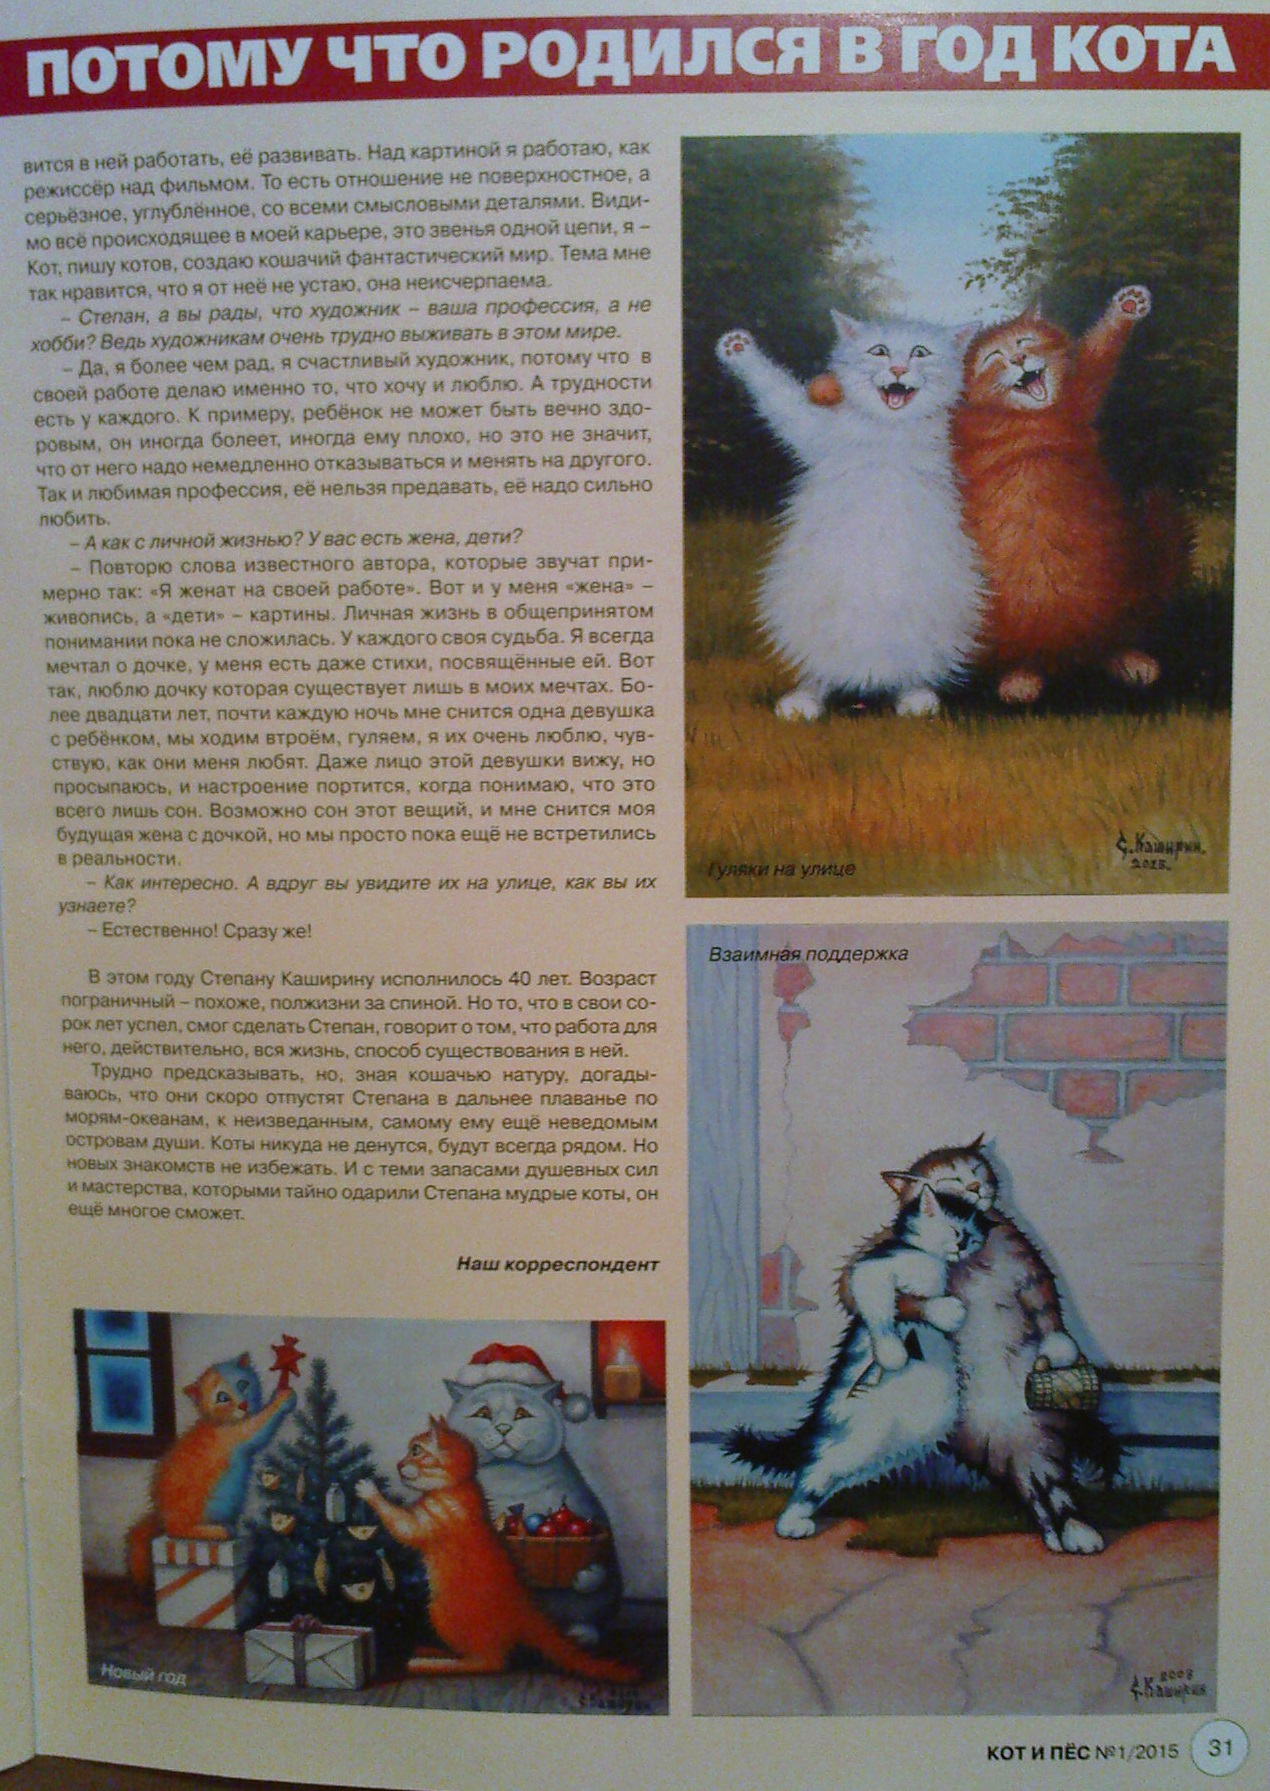 http://www.stepan-kashirin.ru/files/kot-i-pyos-2015-vtoraja.jpg